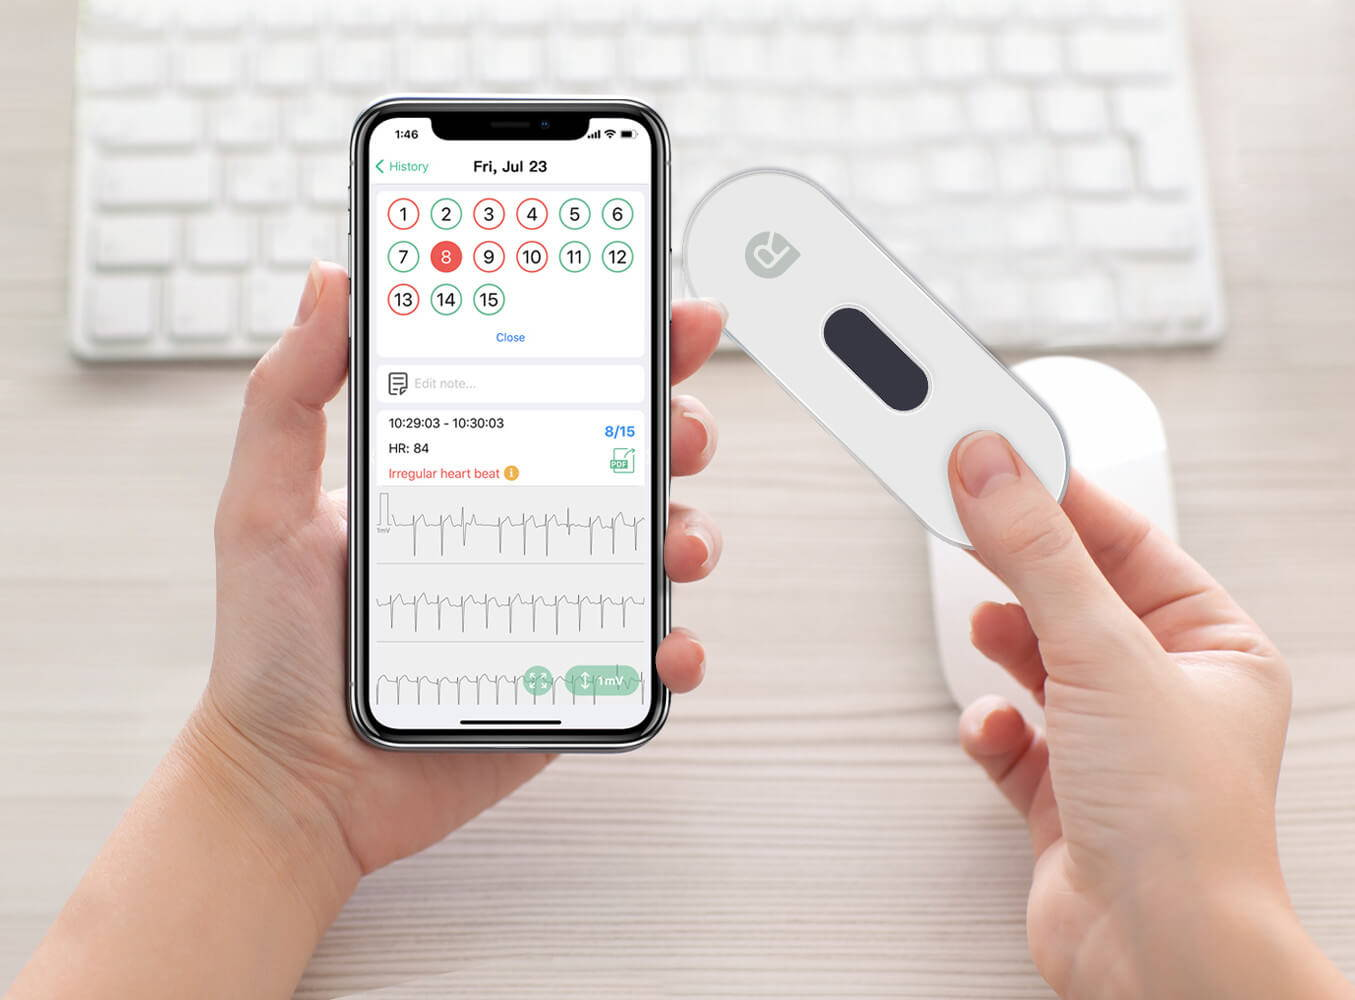 handheld portable EKG monitor, take medical-grade EKG, take instant EKG, app report in EKG monitor